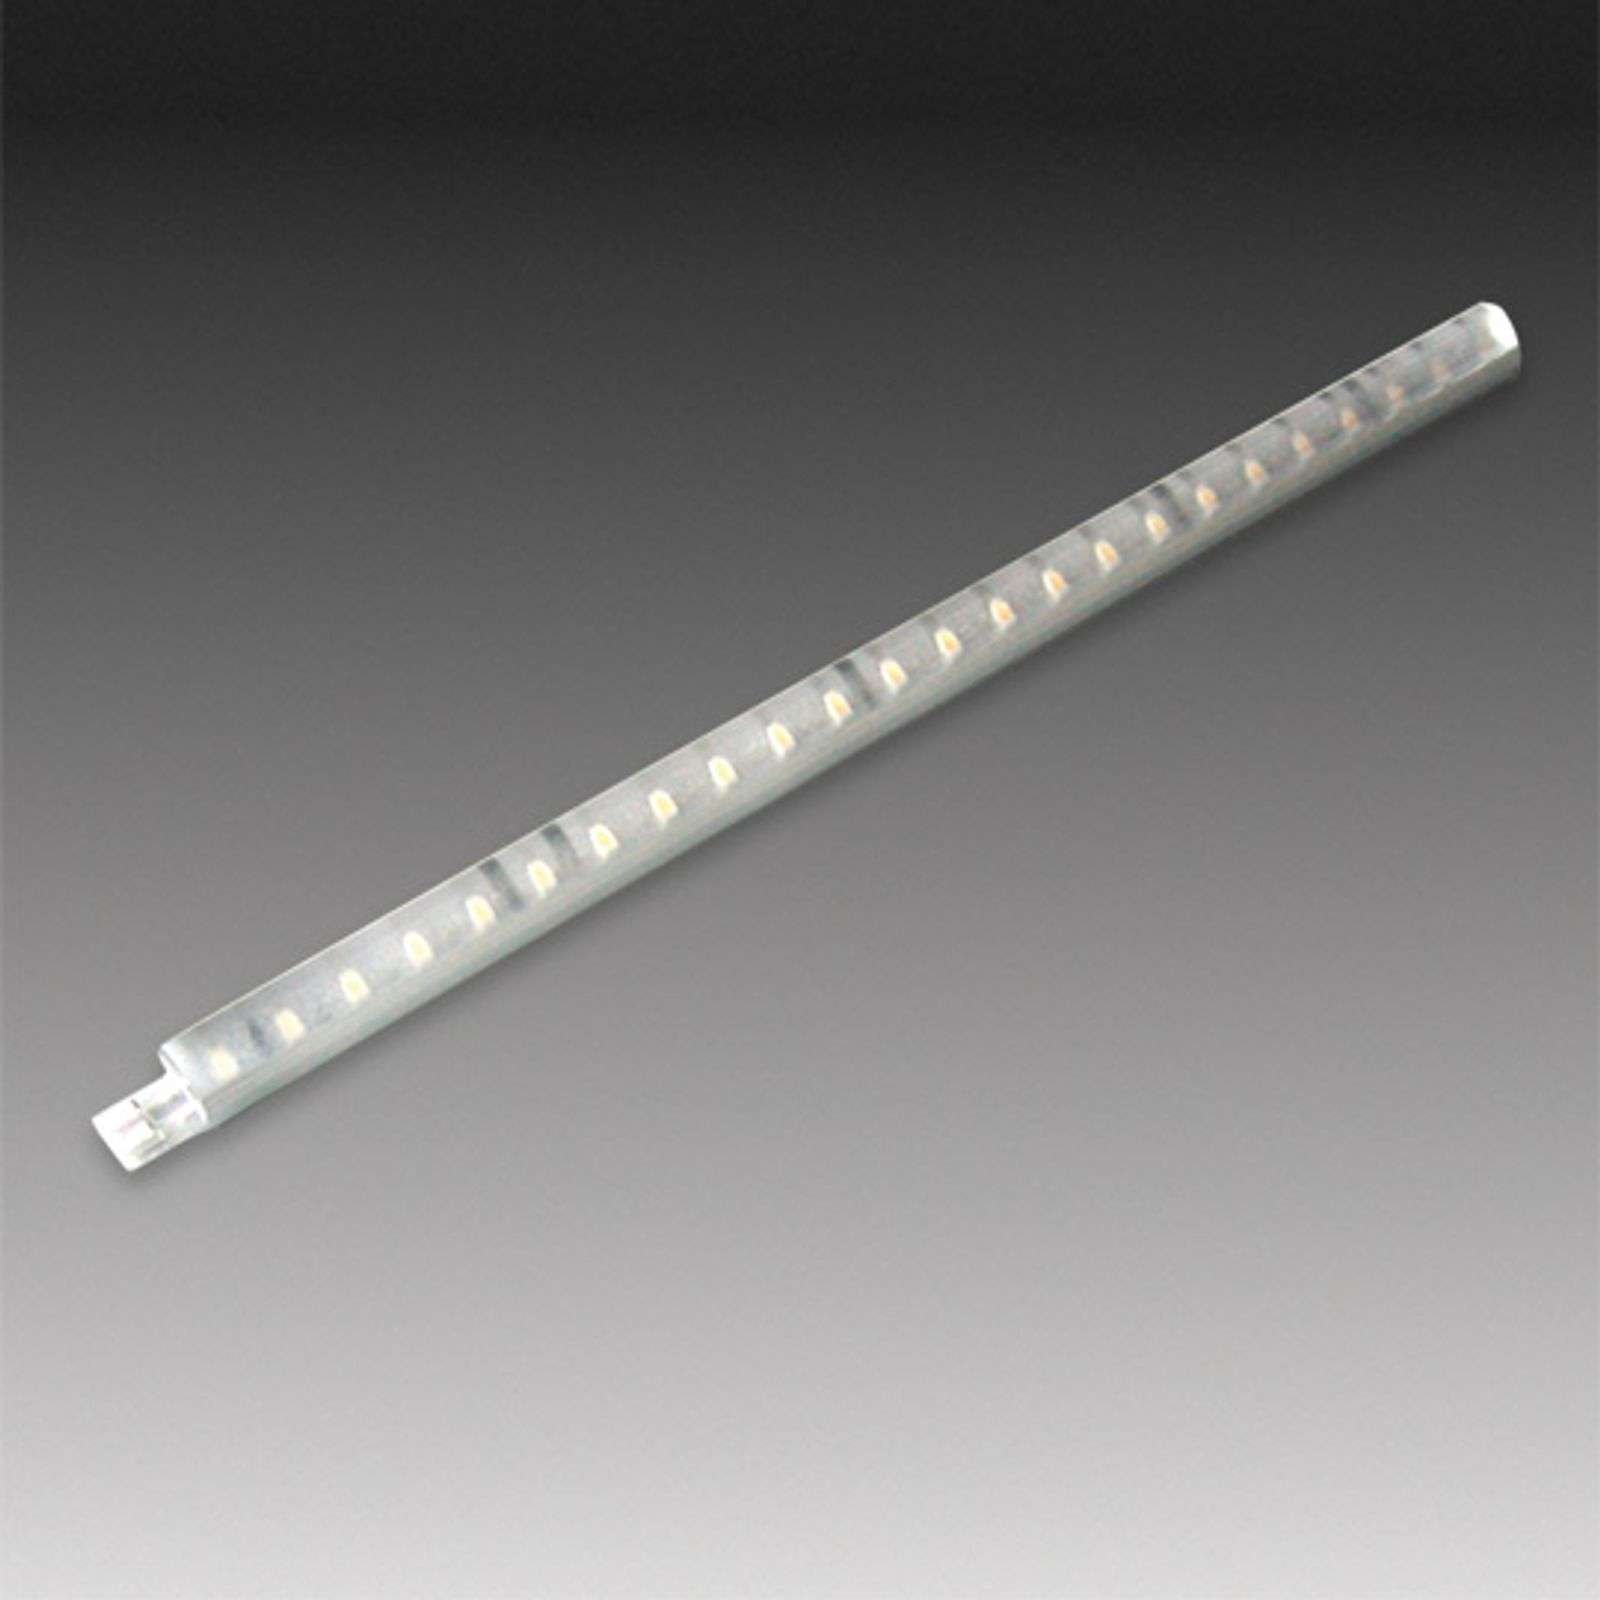 LED STICK 2 plug in LED stick for furniture  cw